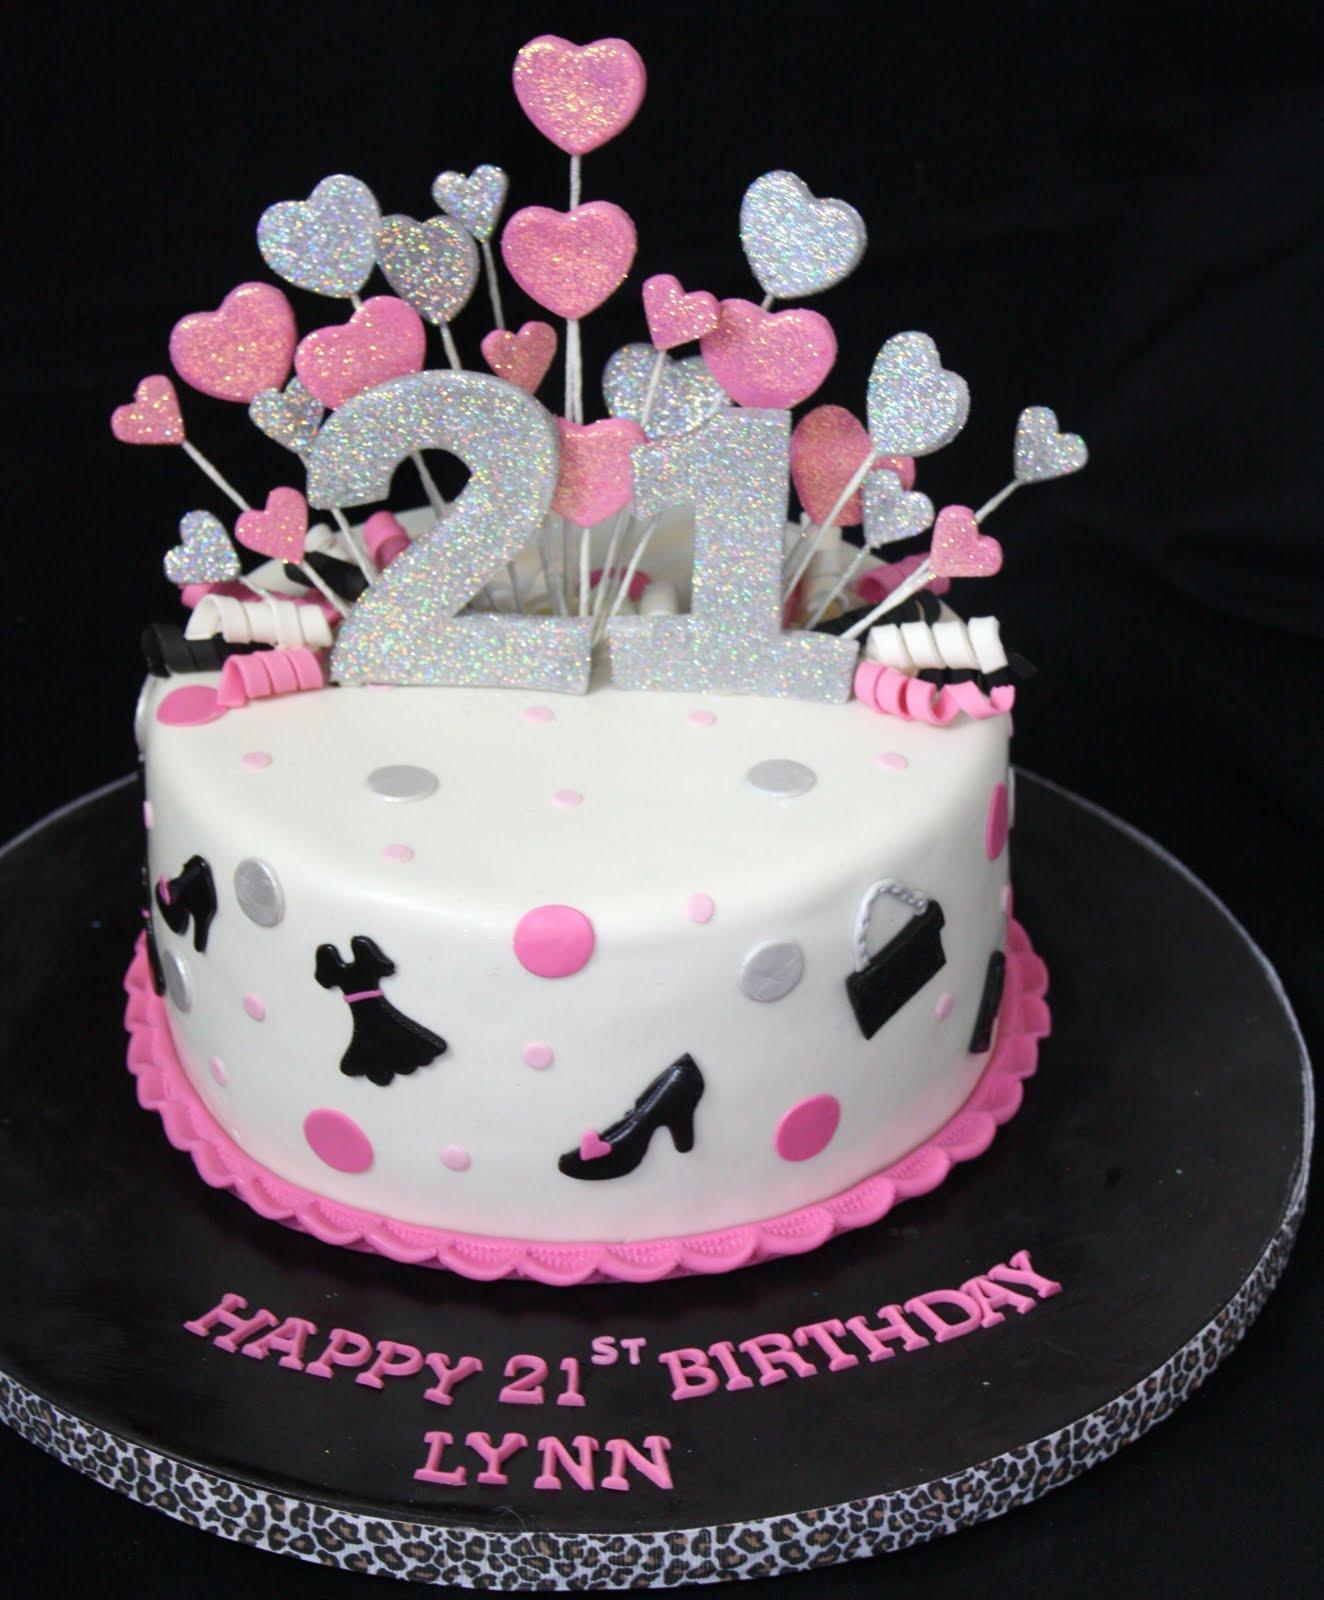 Happy Birthday Wish Red Velvet Cake Sparkle